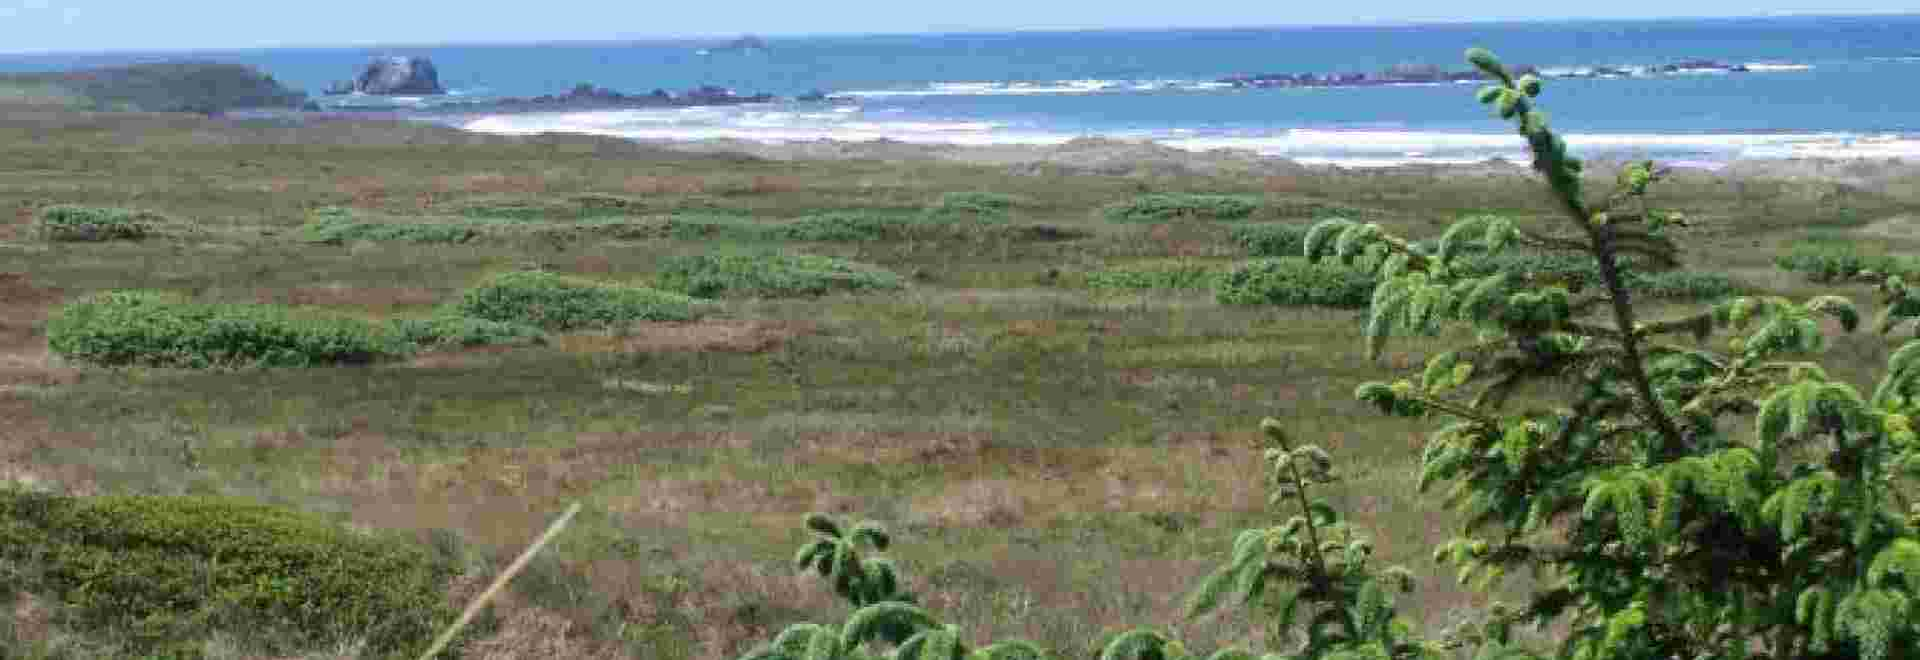 Coastal Wetlands of Tolowa Dunes State Park